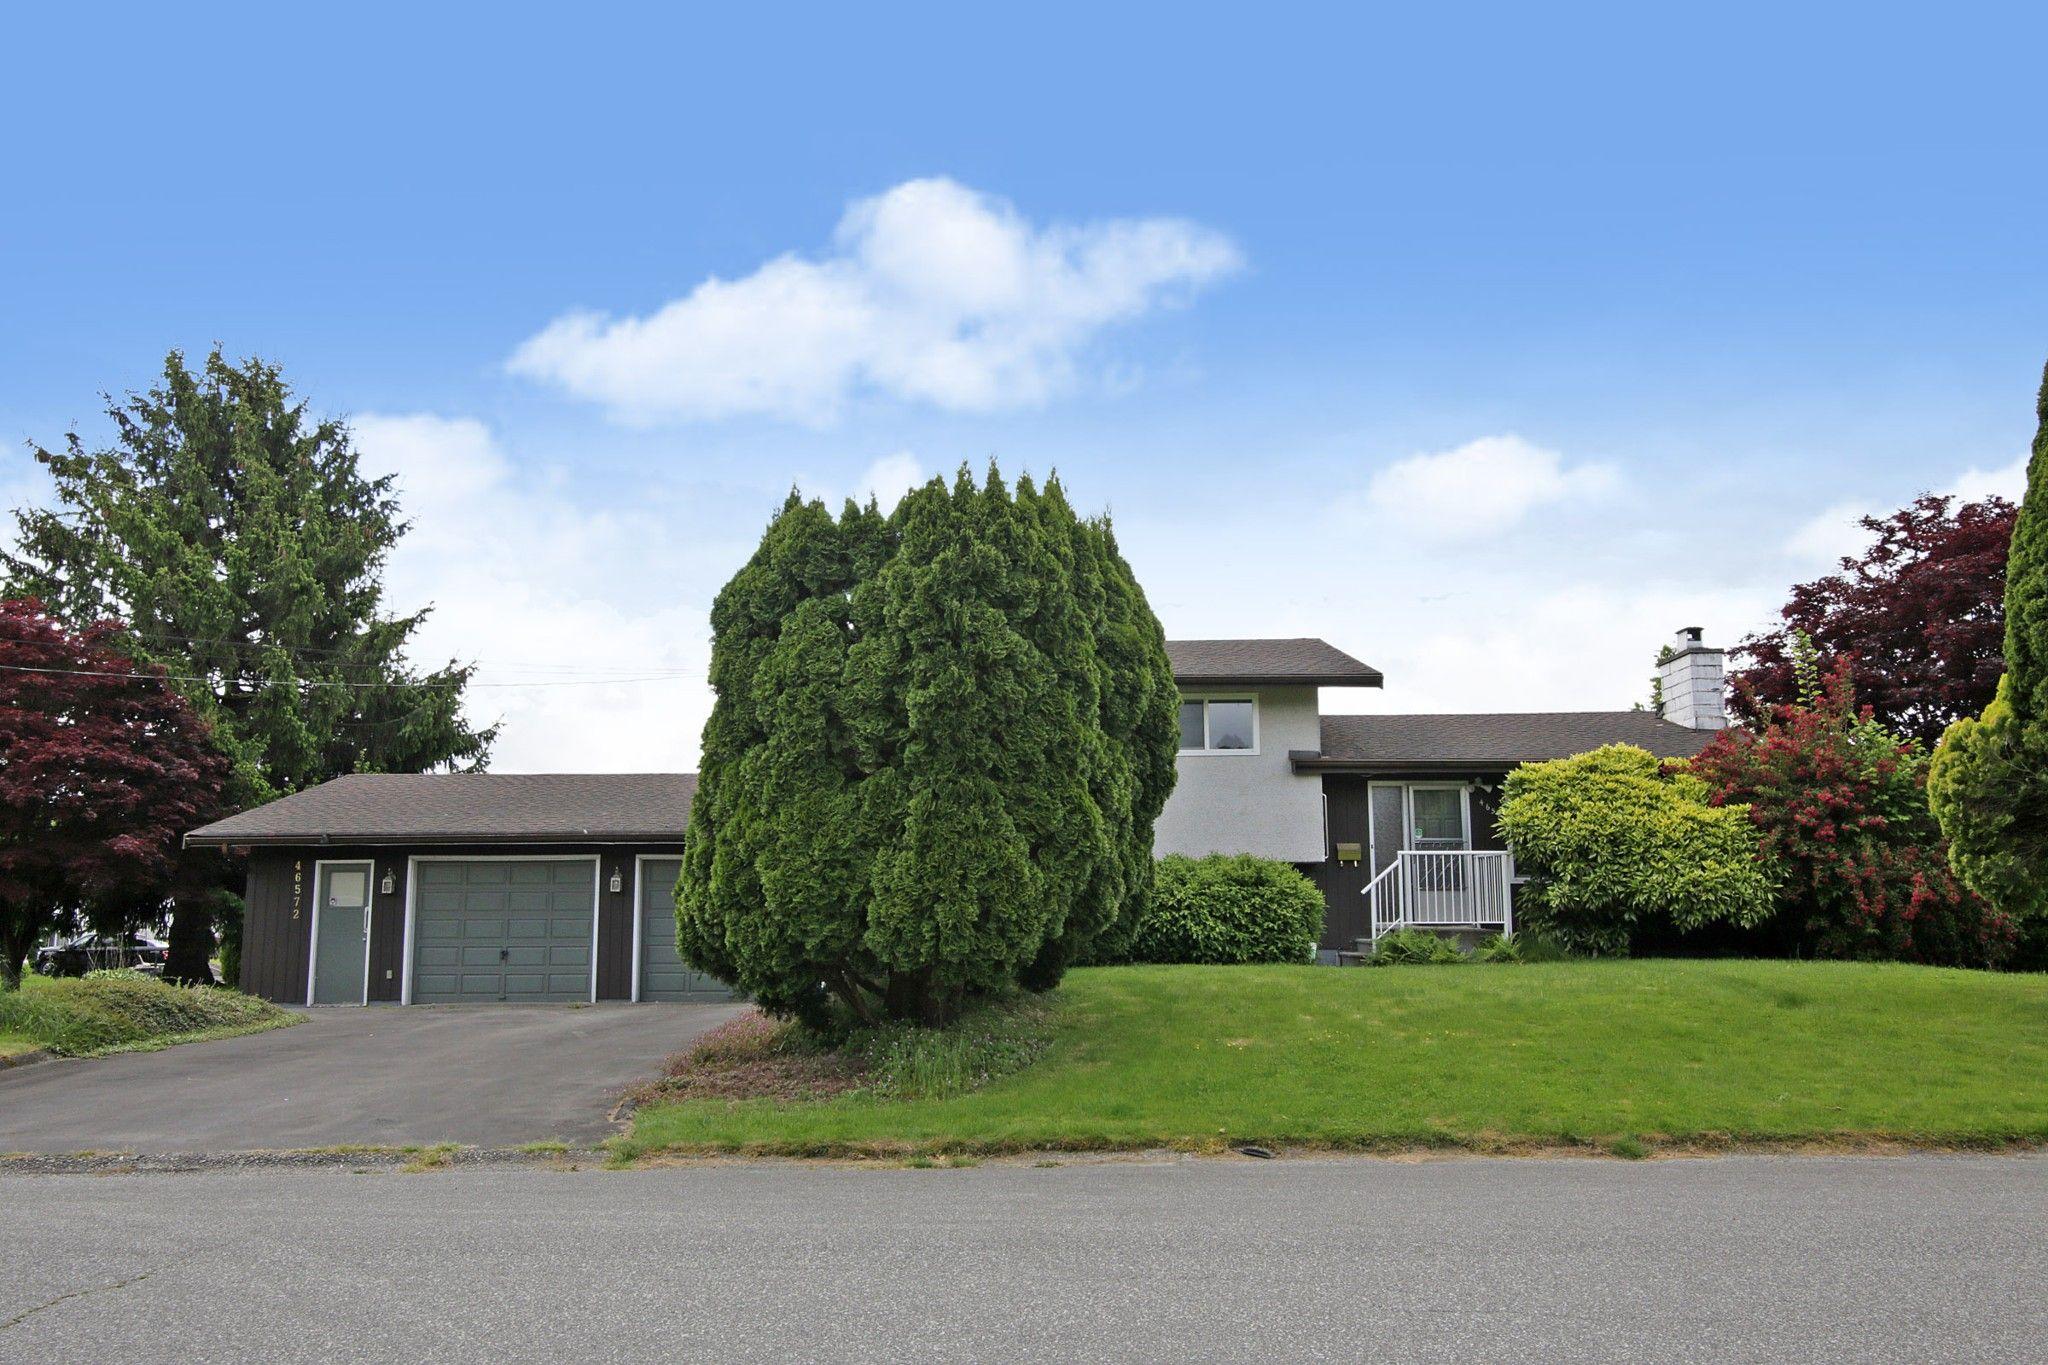 Main Photo: 46572 MONTANA Drive in Chilliwack: Fairfield Island House for sale : MLS®# R2585767